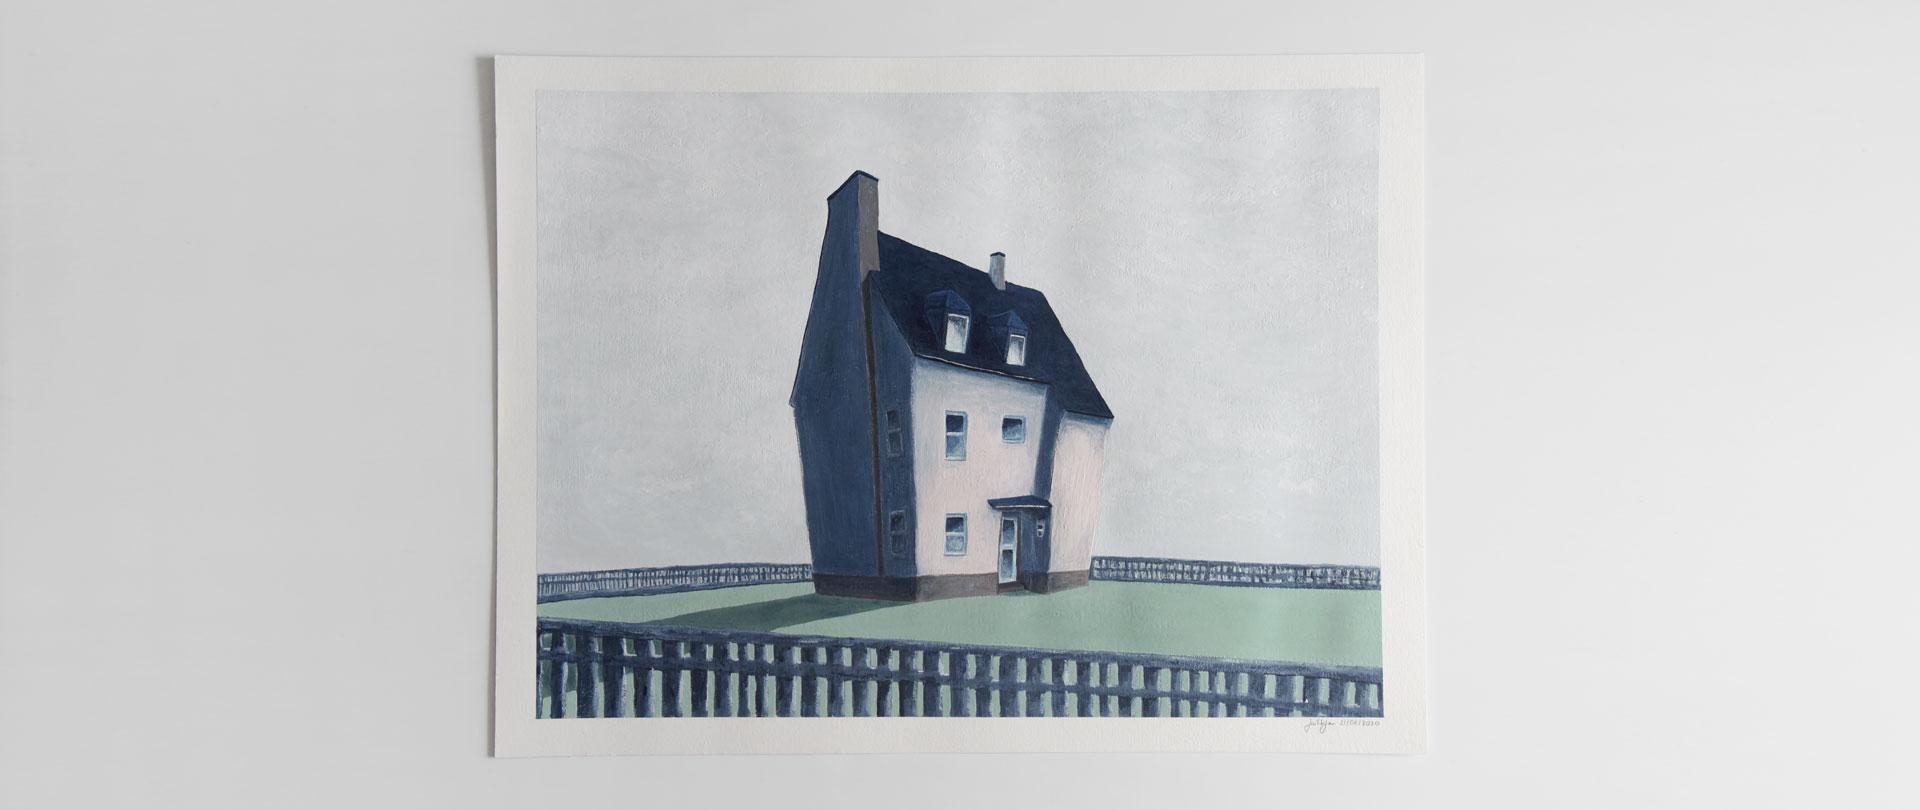 Home; House; Garden; Sky; Alone; Painting; Gouache; Illustration